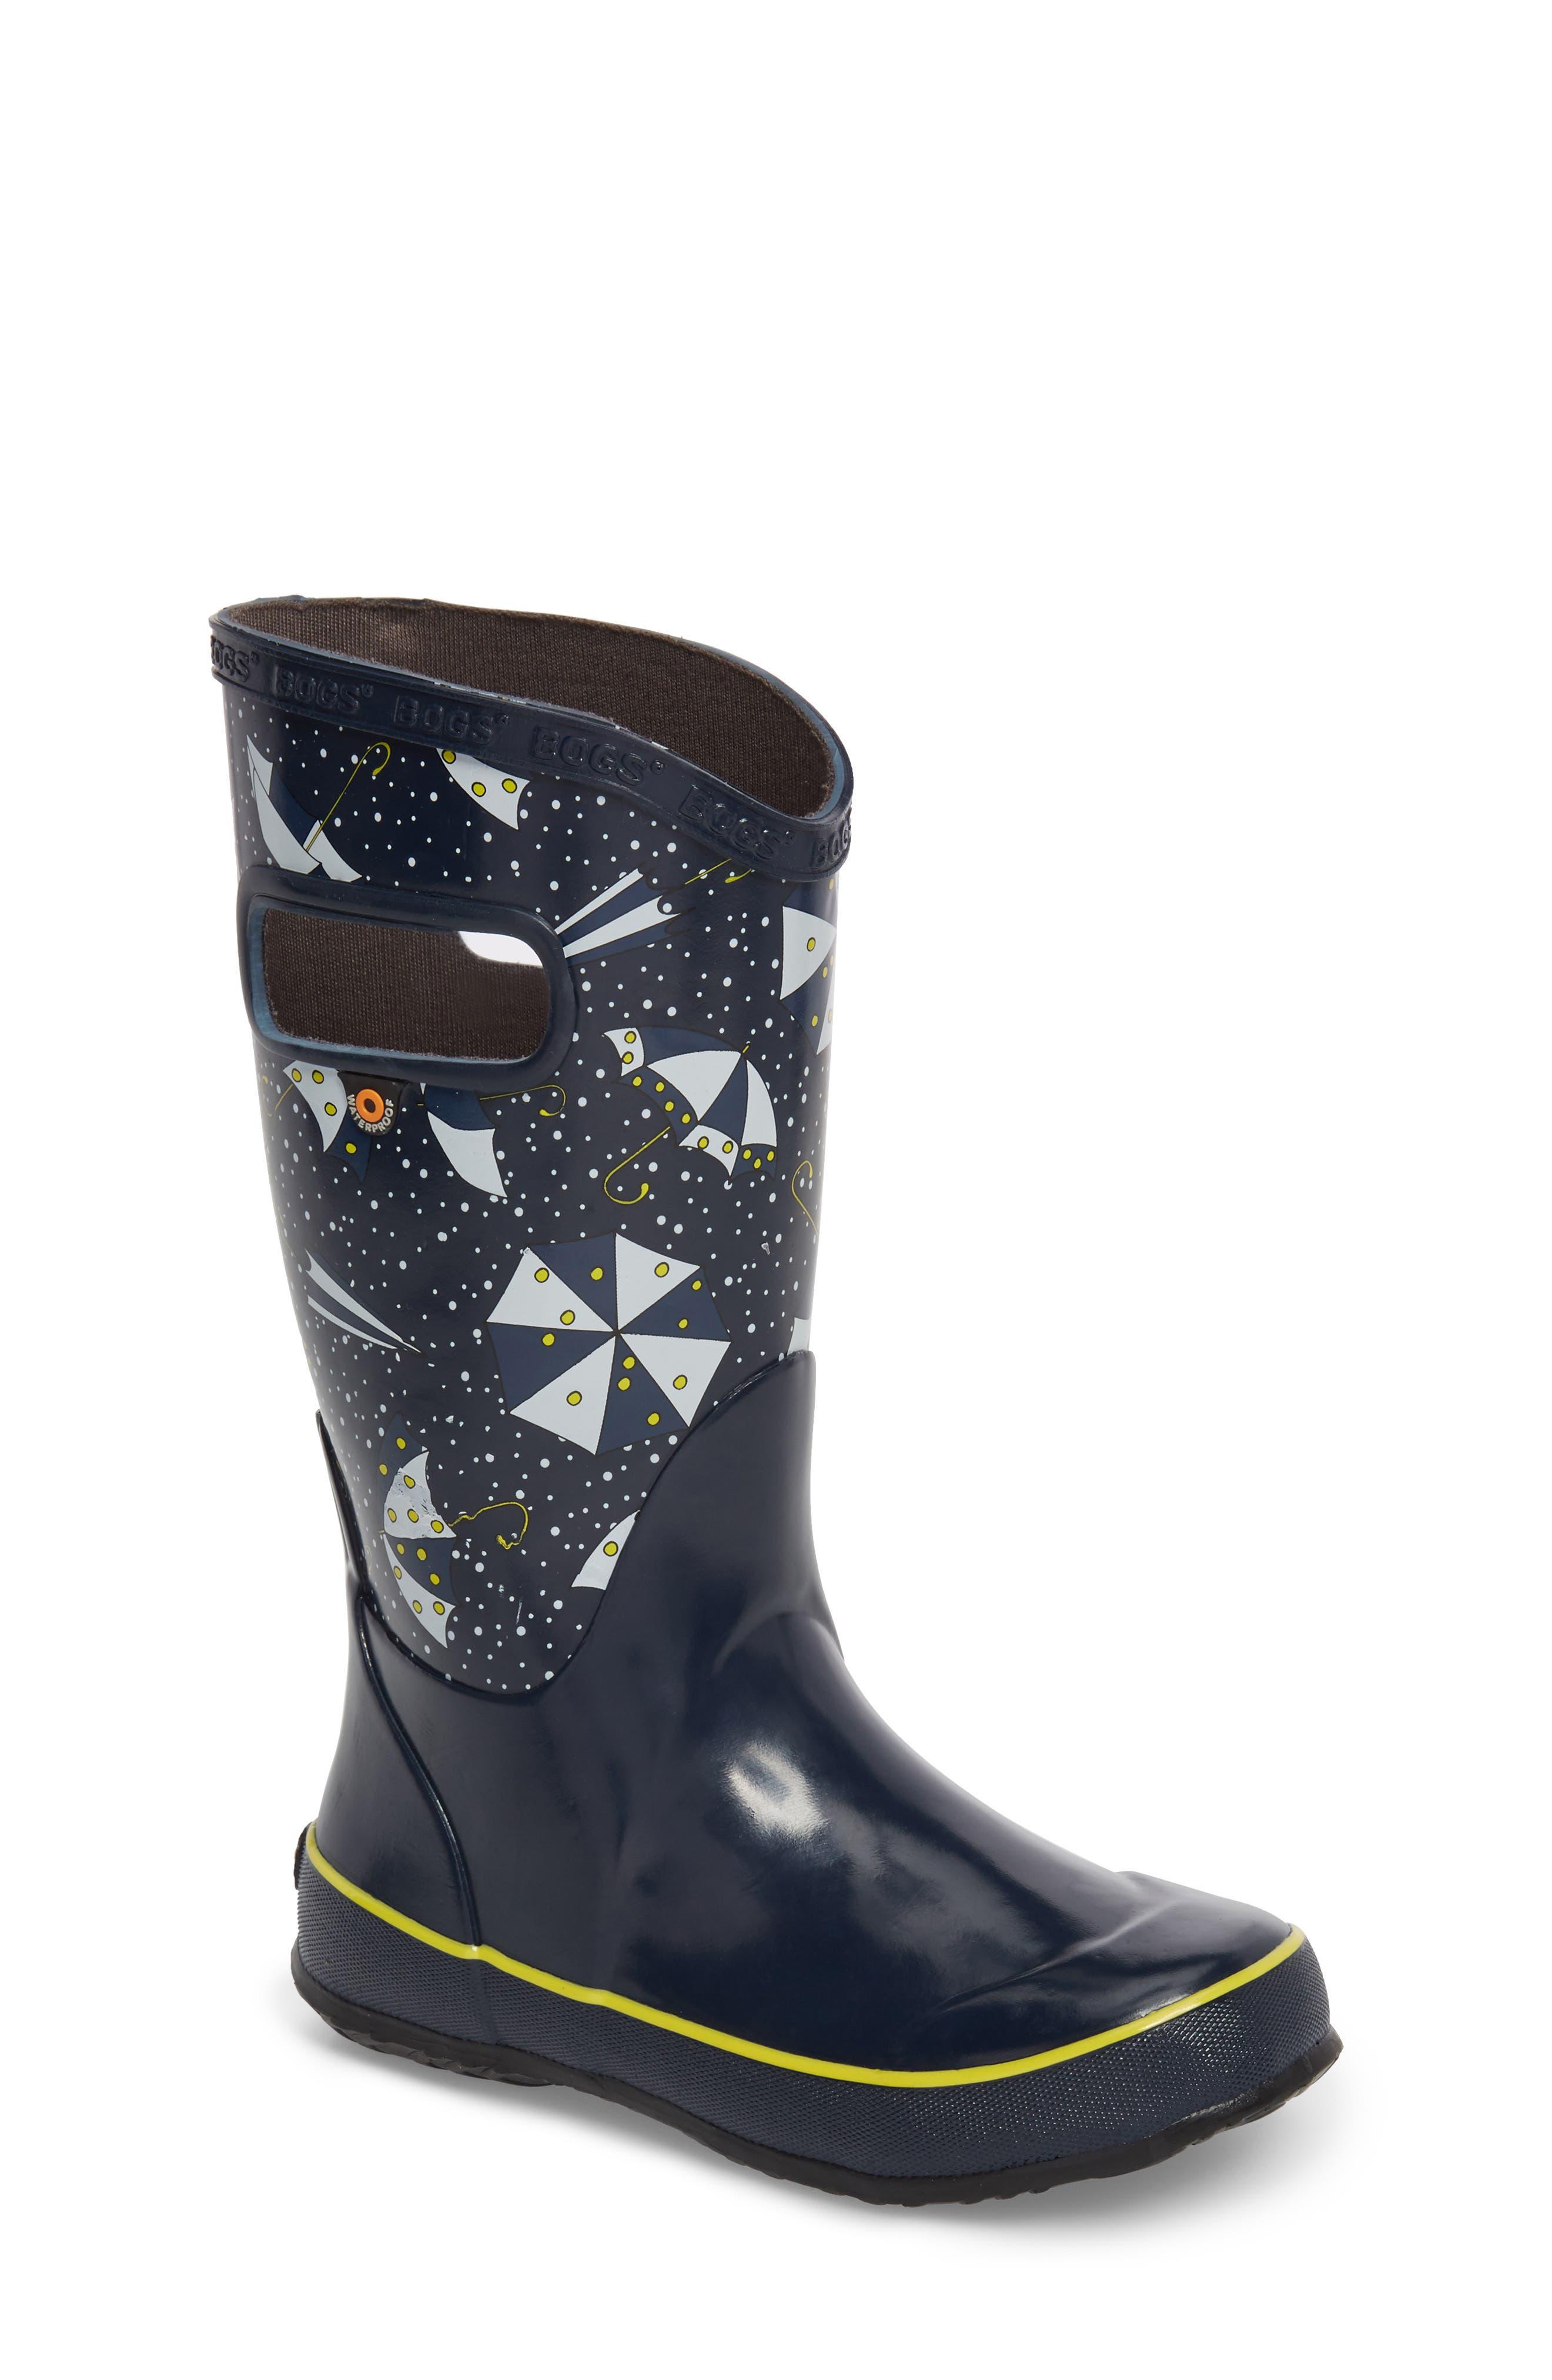 Umbrellas Waterproof Rubber Rain Boot,                             Main thumbnail 1, color,                             Dark Blue Multi